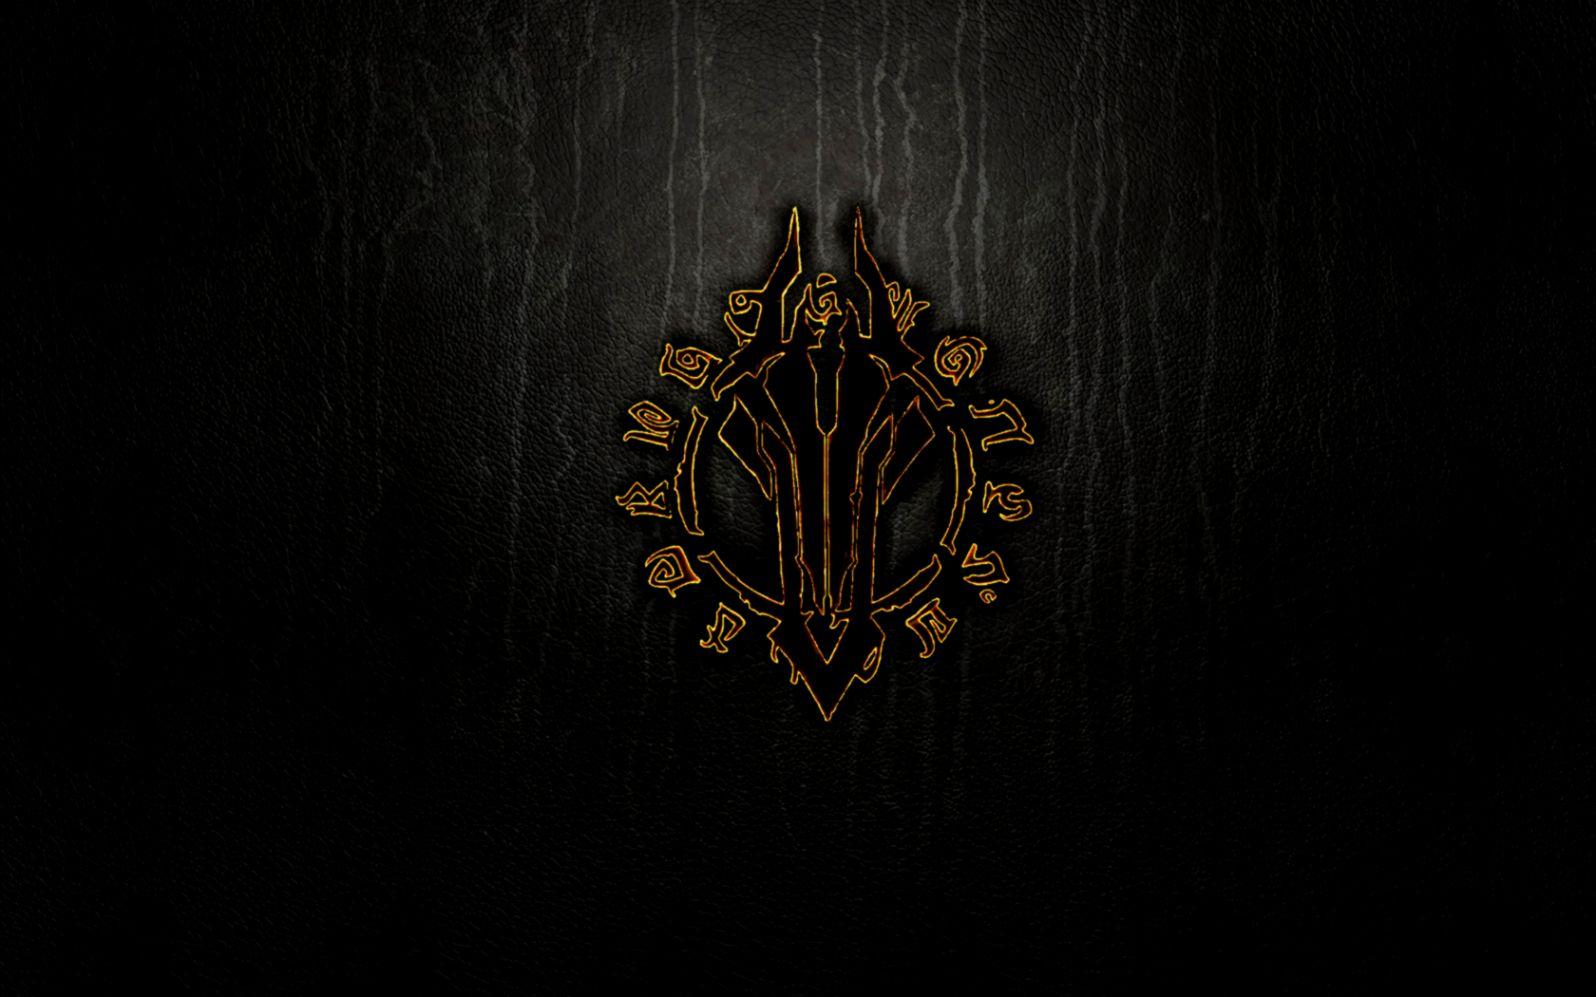 Darksiders Logo Wallpaper All Hd Wallpapers